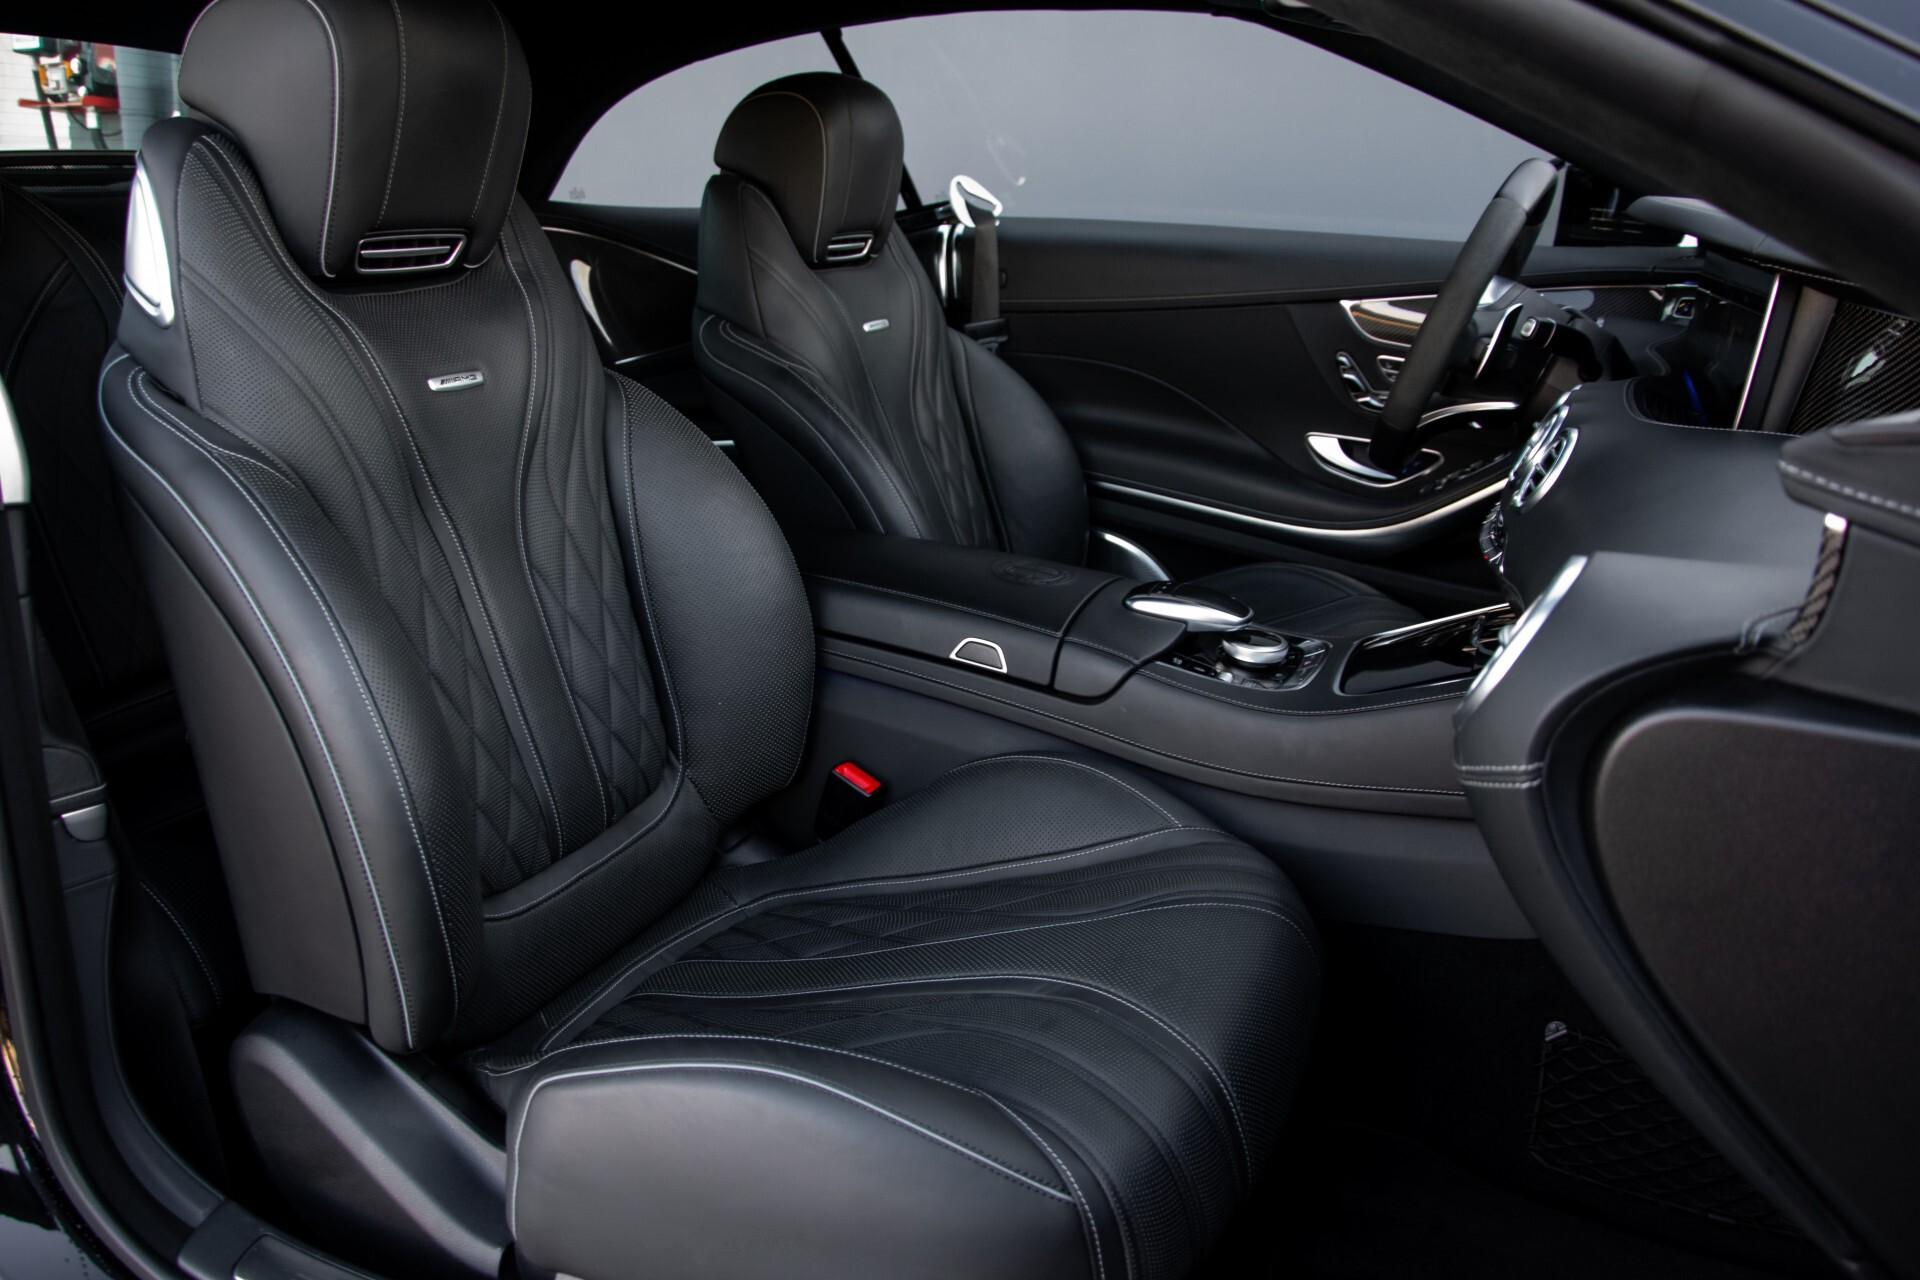 Mercedes-Benz S-Klasse Cabrio 63 AMG 4M+ Keramisch/Burmester High End 3D/Carbon/Driverspack/Blackpack Aut9 Foto 5